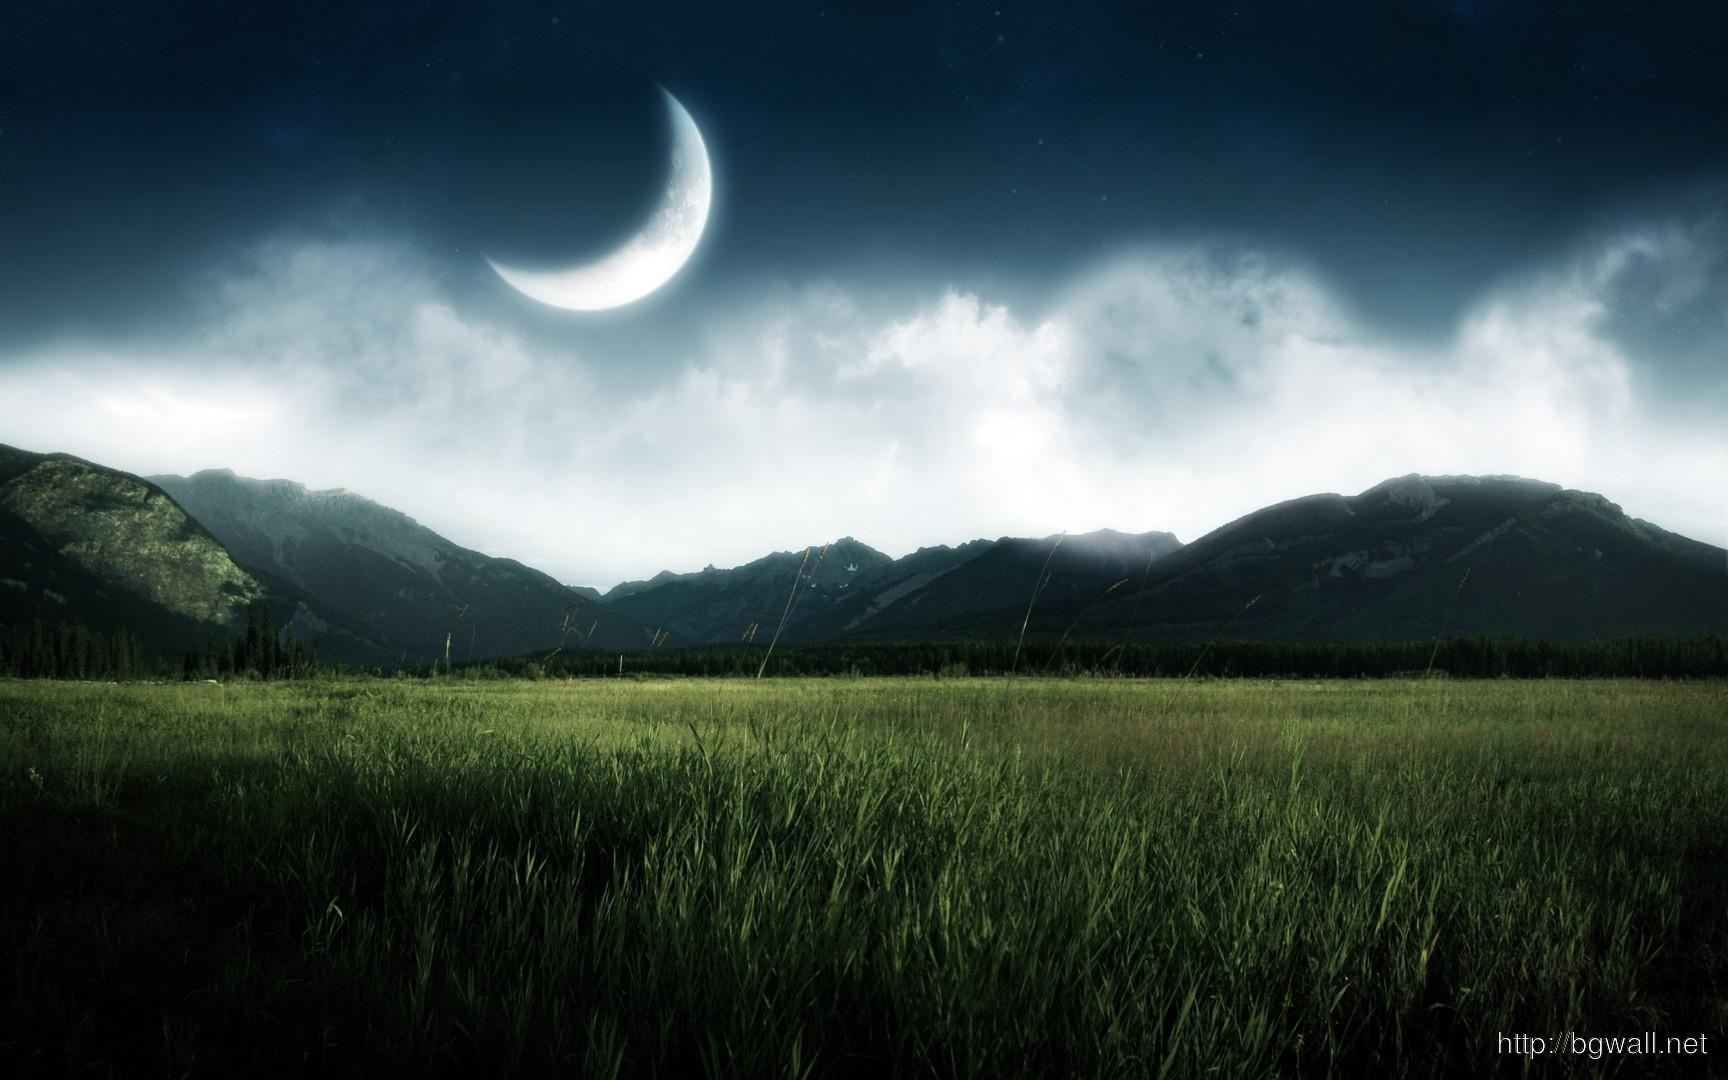 Moon In The Sky Wallpaper 5372 Full Size